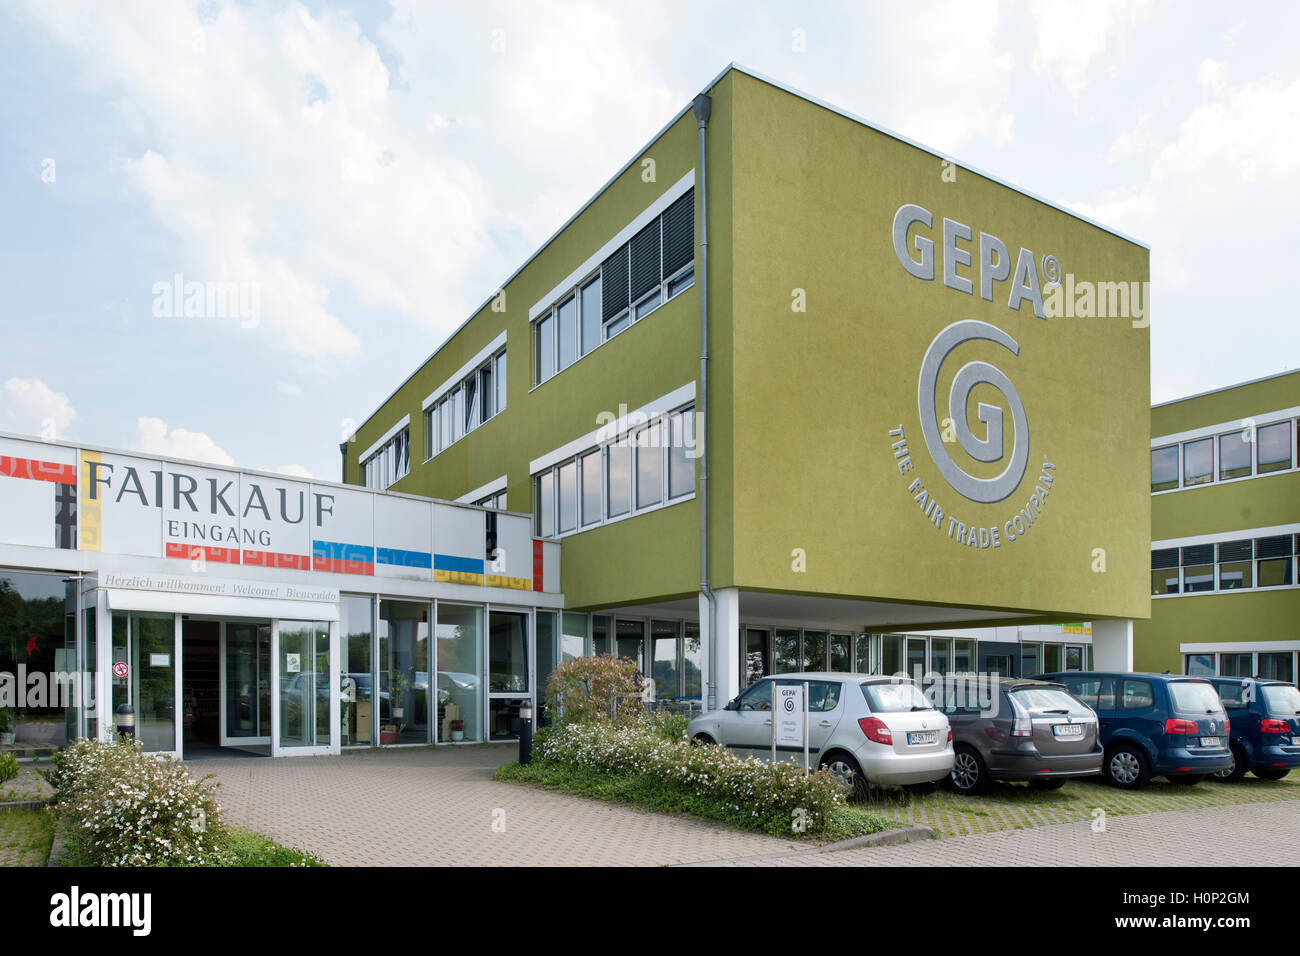 Deutschland, Nordrhein-Westfalen, Wuppertal-Vohwinkel, GEPA The Fair Trade Company - Stock Image